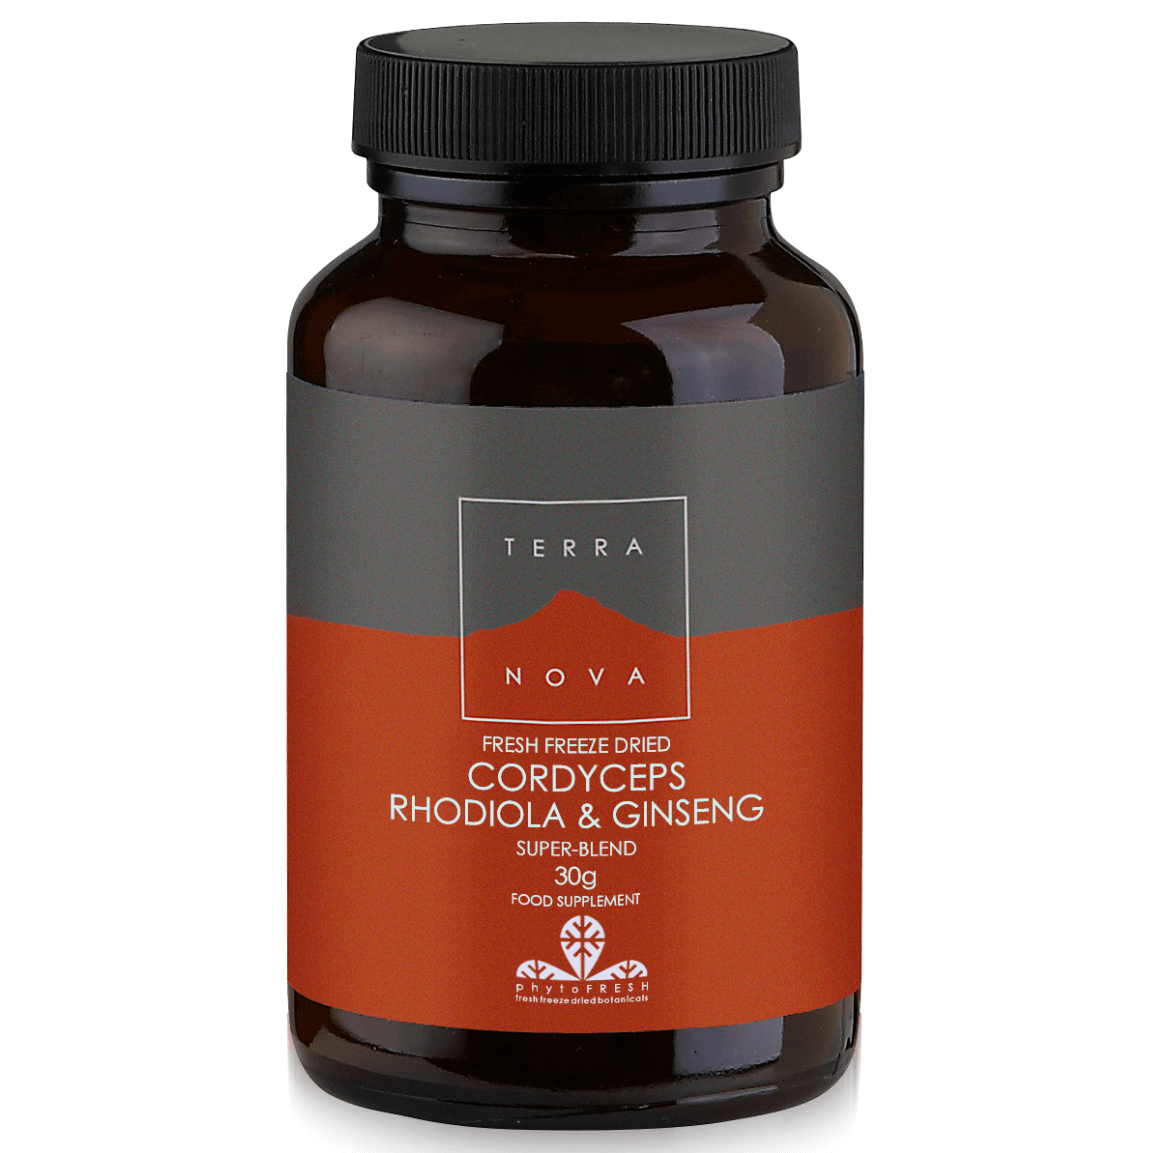 Terranova Cordyceps Rhodiola & Ginseng Άμεση Φυσική και Πνευματική Τόνωση για Υψηλές Επιδόσεις 30gr